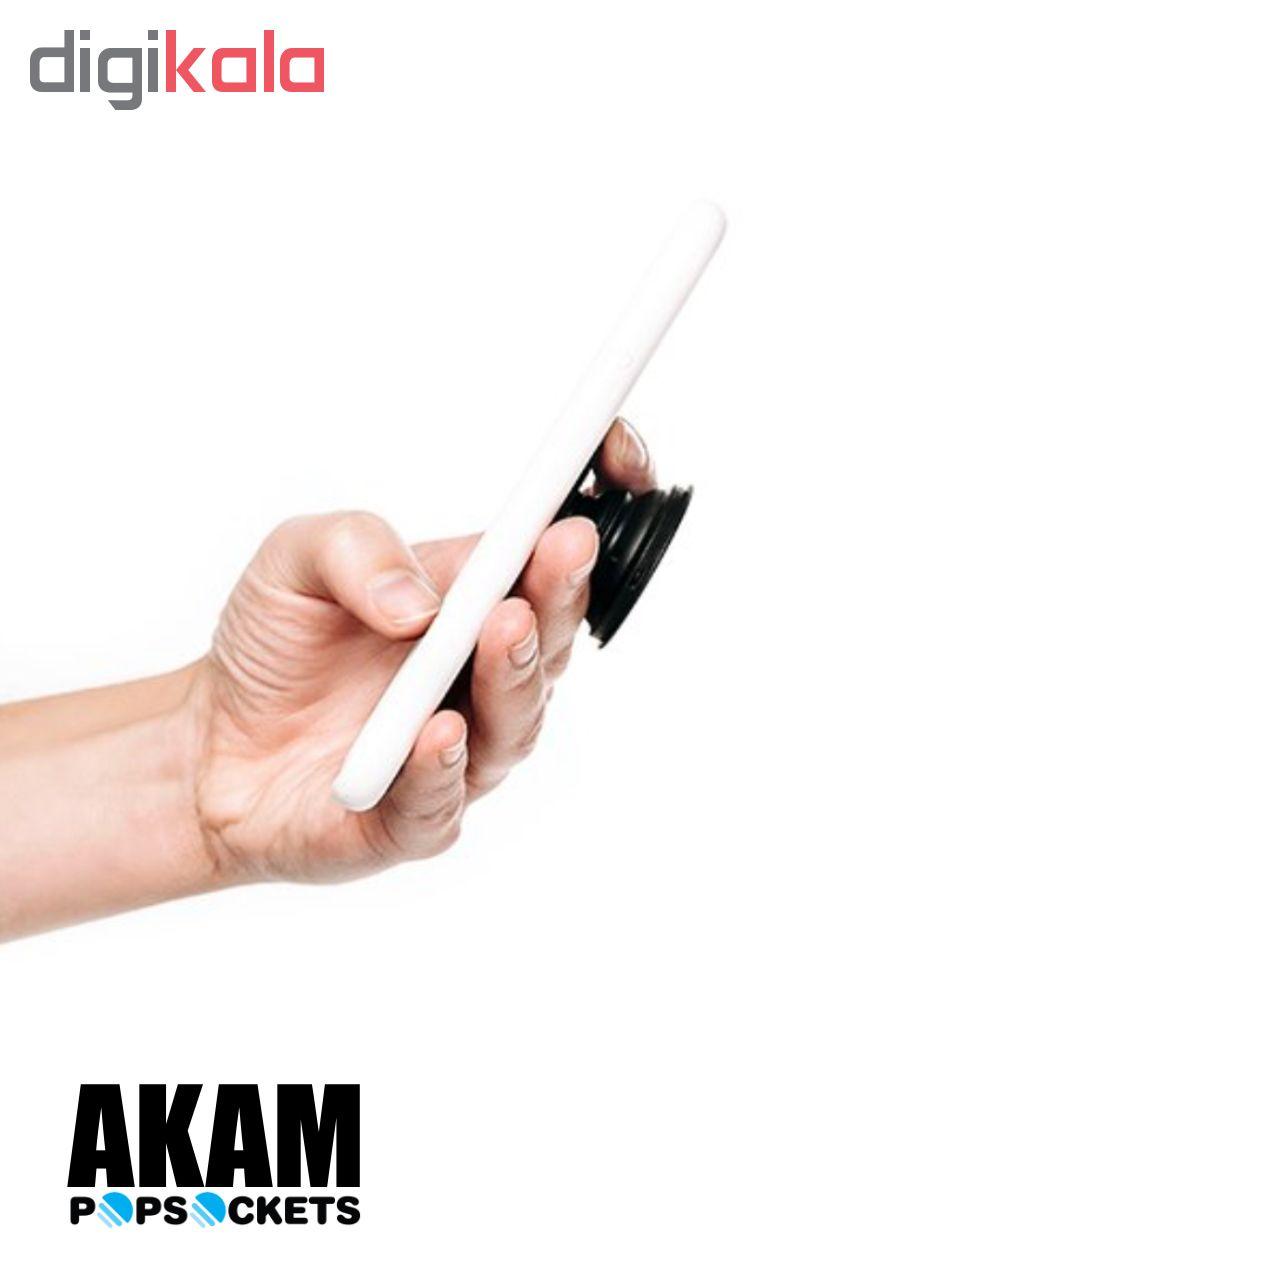 پایه نگهدارنده گوشی  موبایل پاپ سوکت آکام مدل APS0014 main 1 7